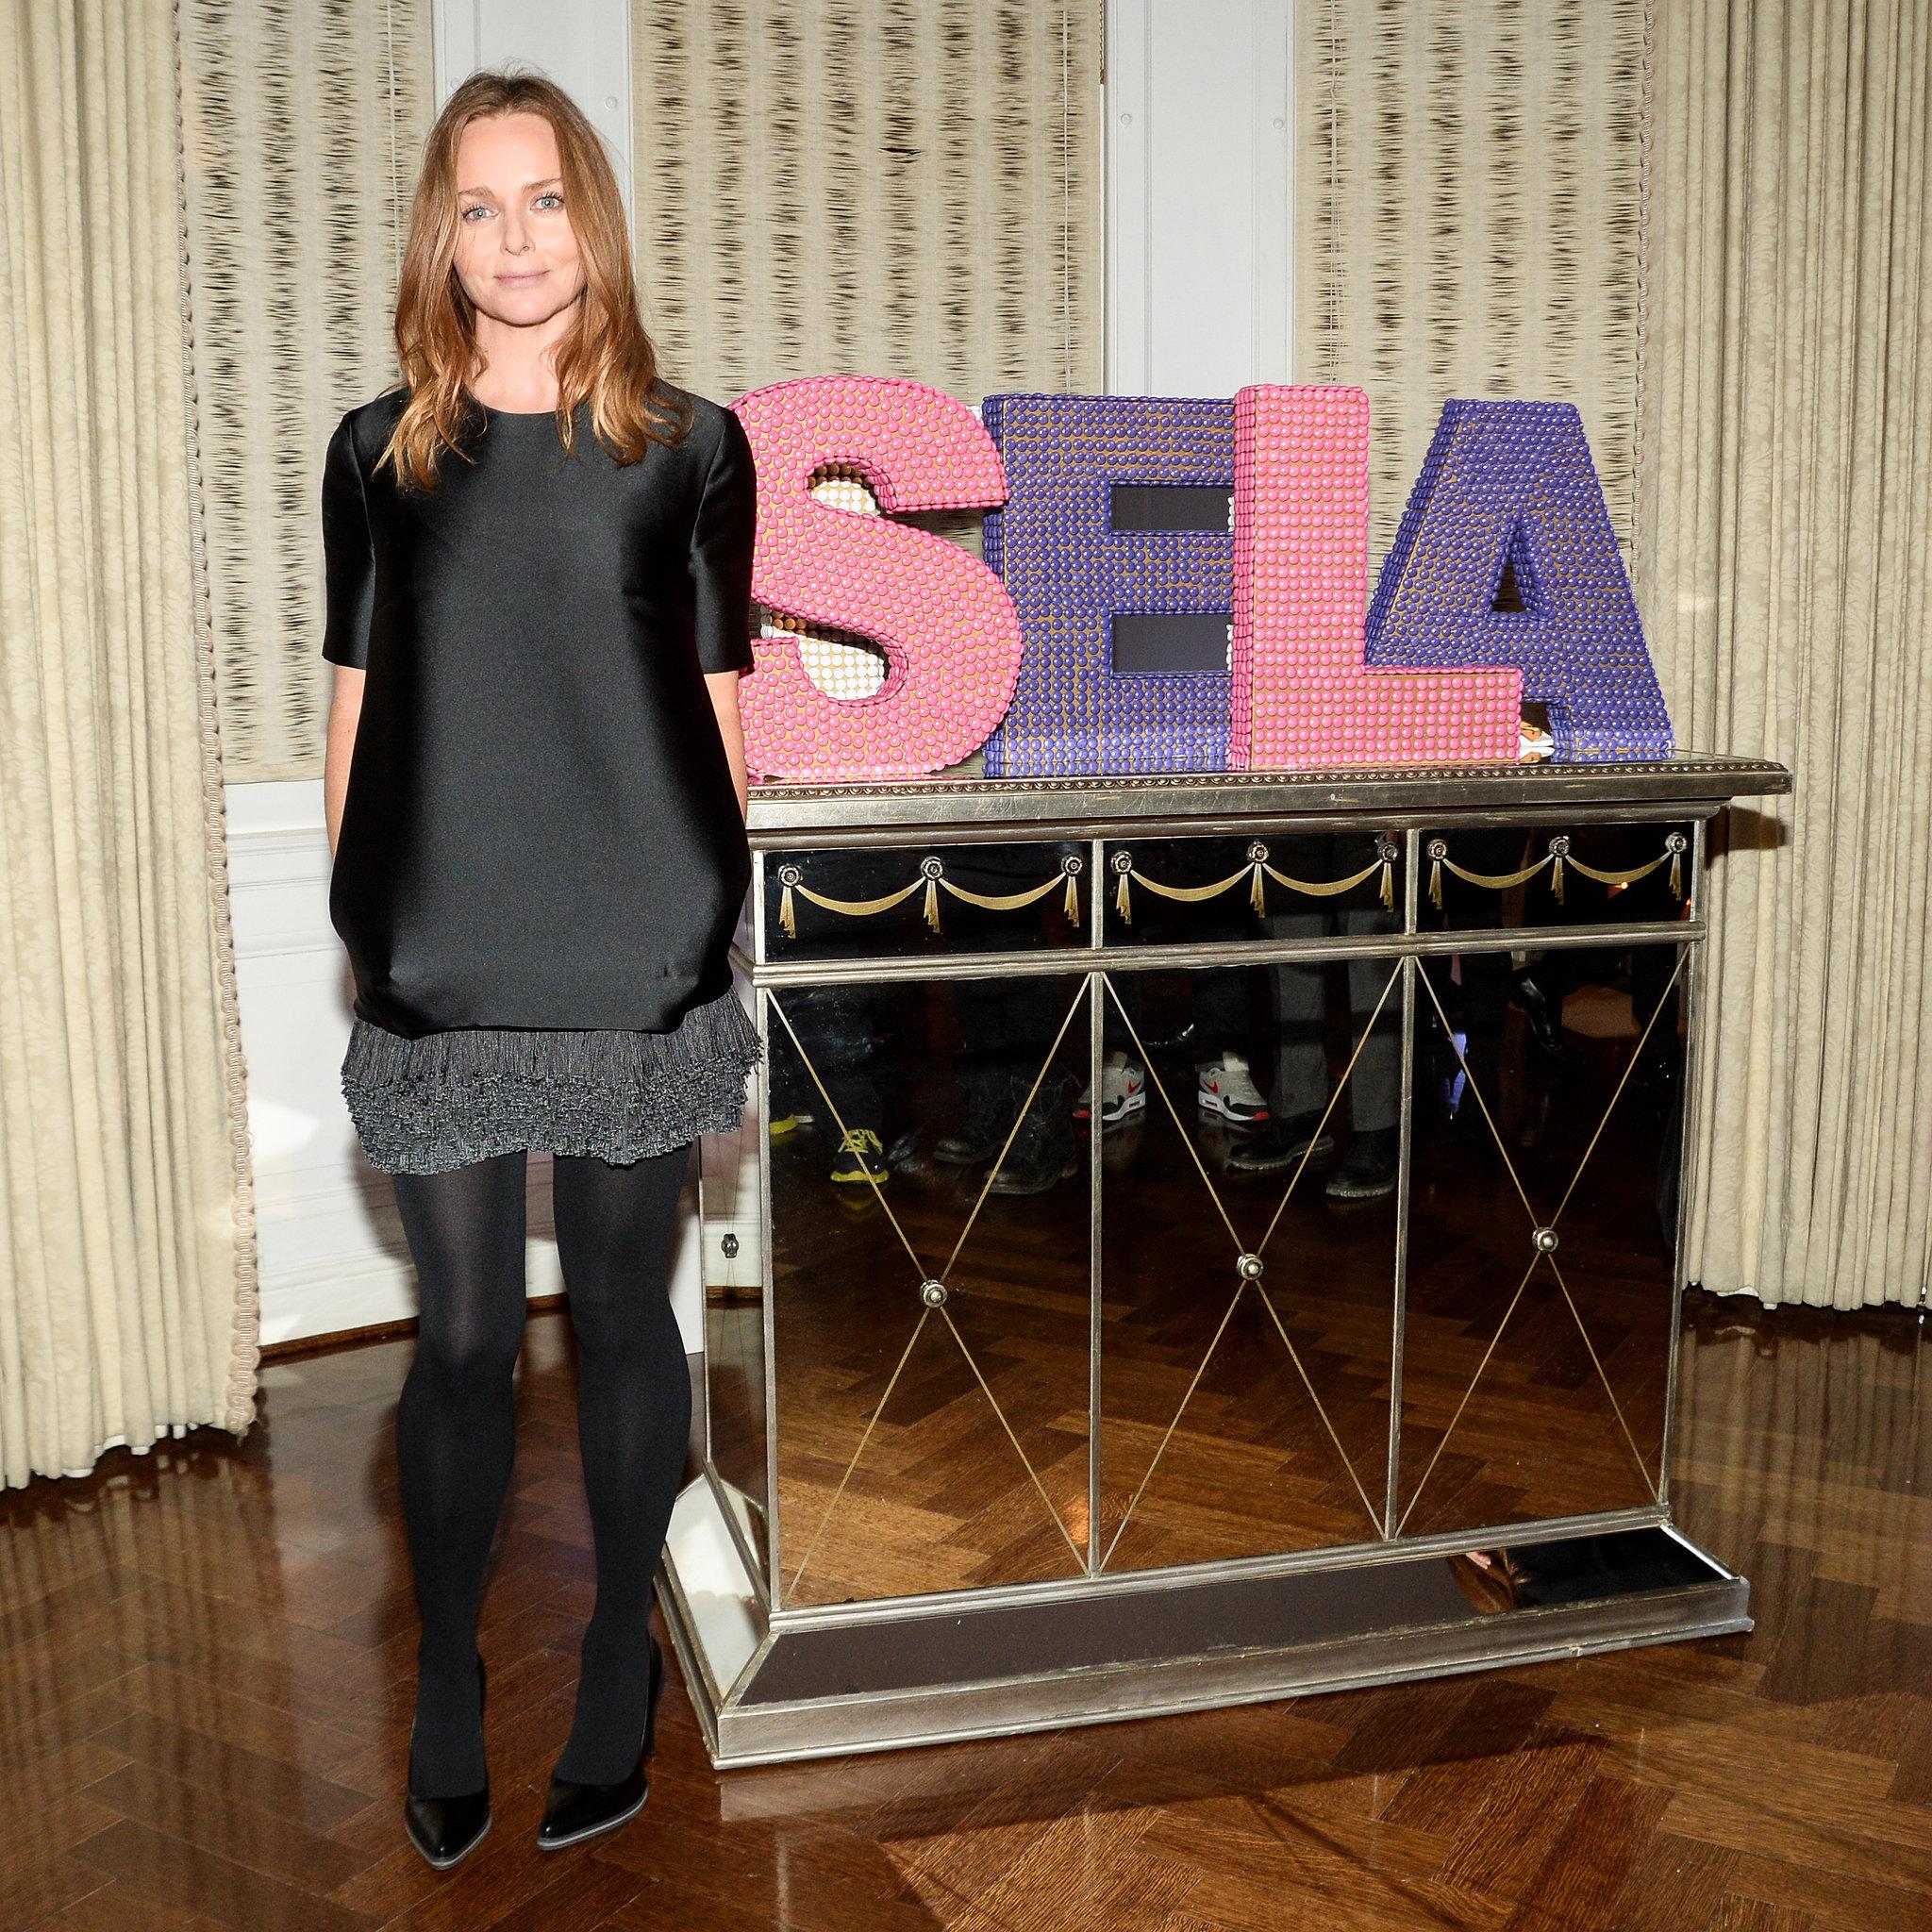 Stella McCartney at the Stella McCartney Pre-Fall 2014 presentation.